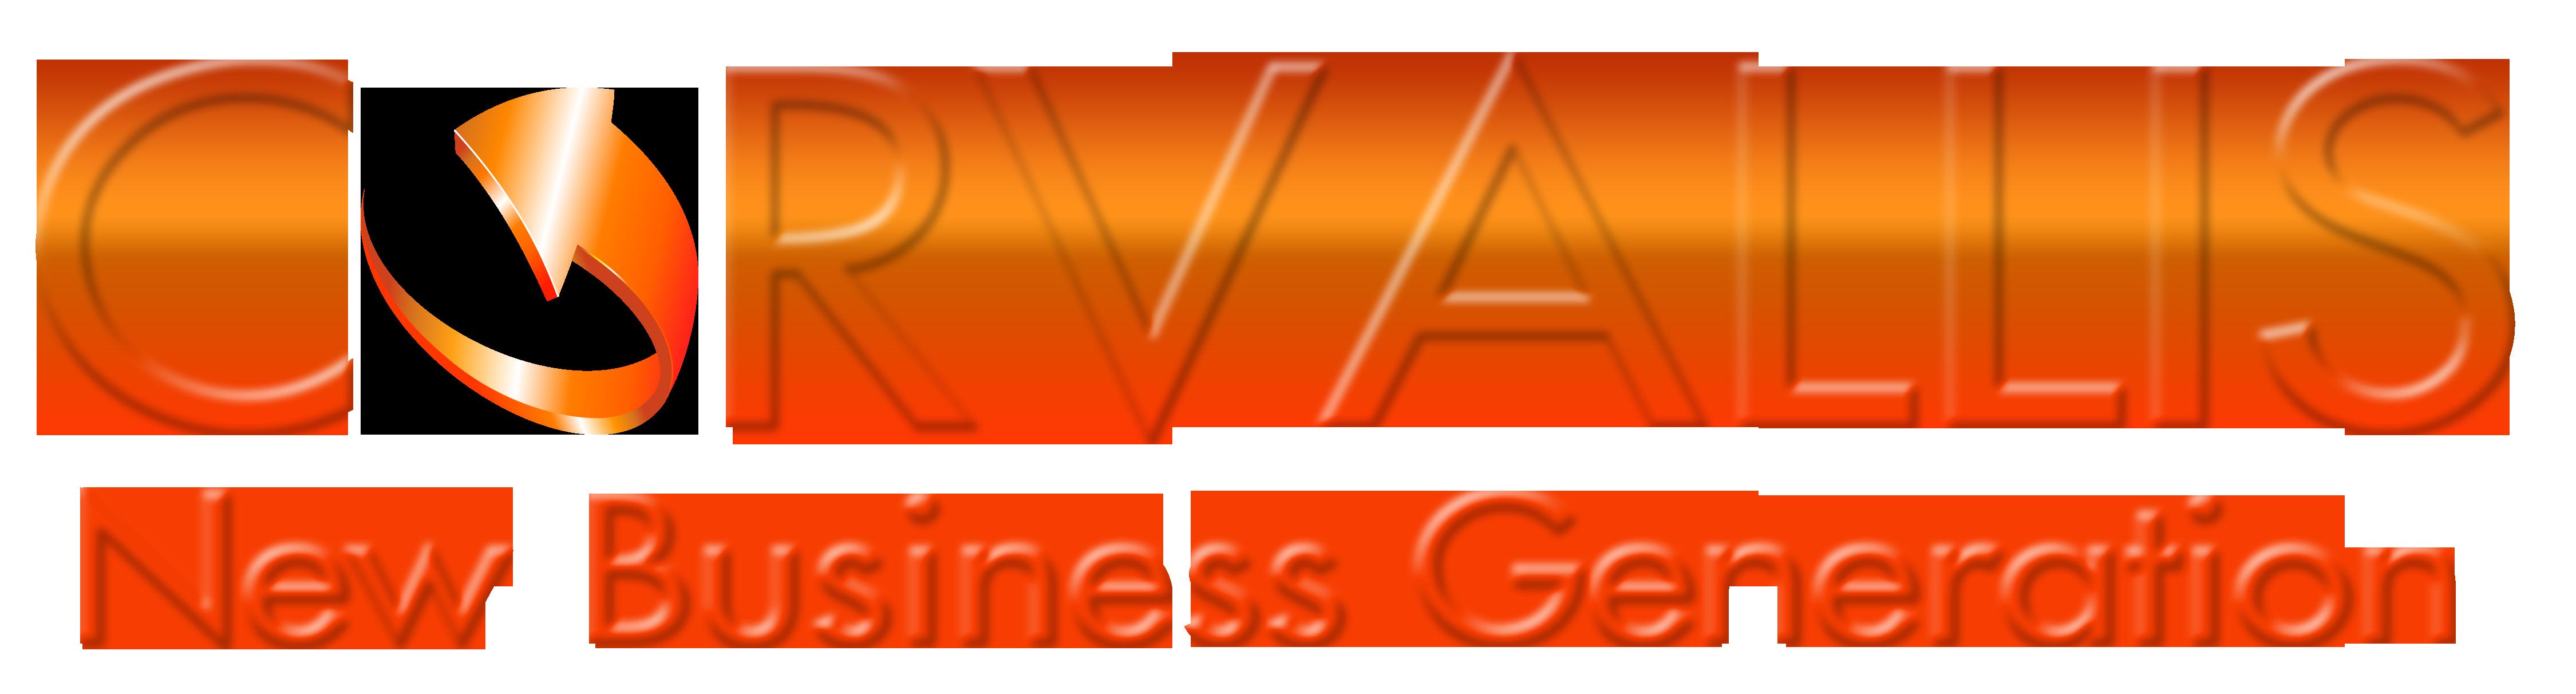 Corvallis New Business Generation